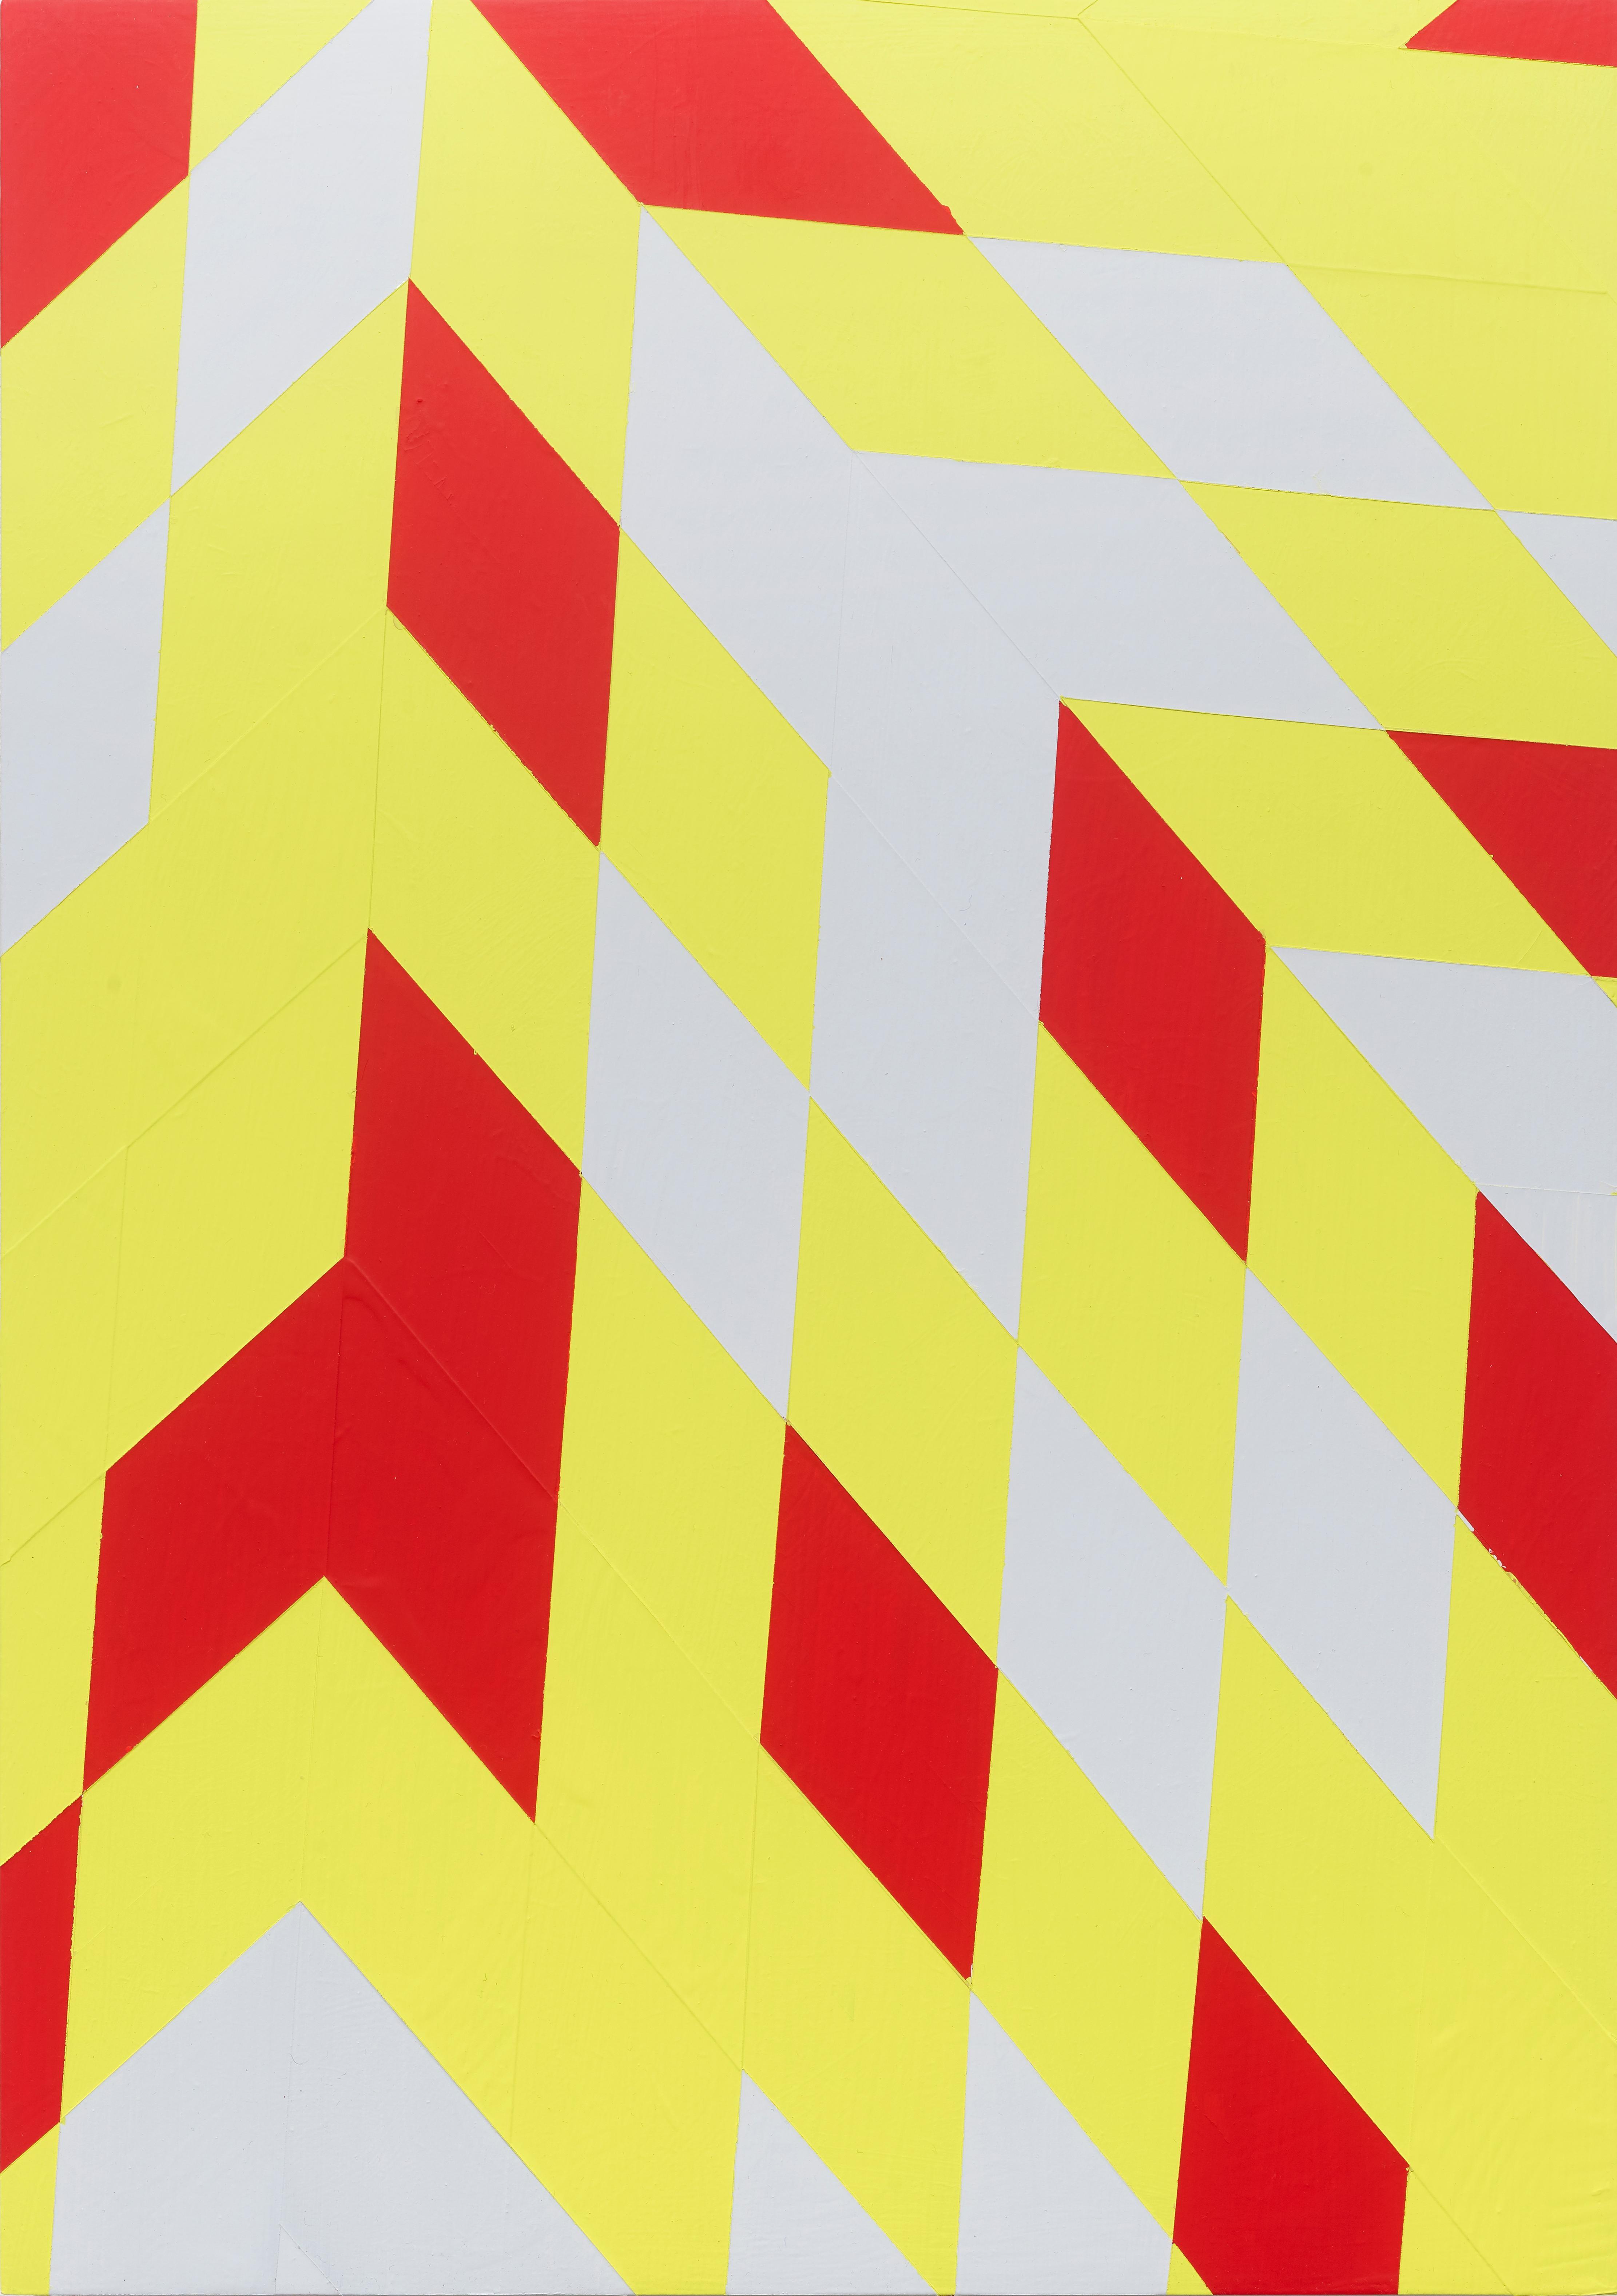 Untitled (M 104) / Rhombus, red, yellow, constructivist, hard edge, minimalist